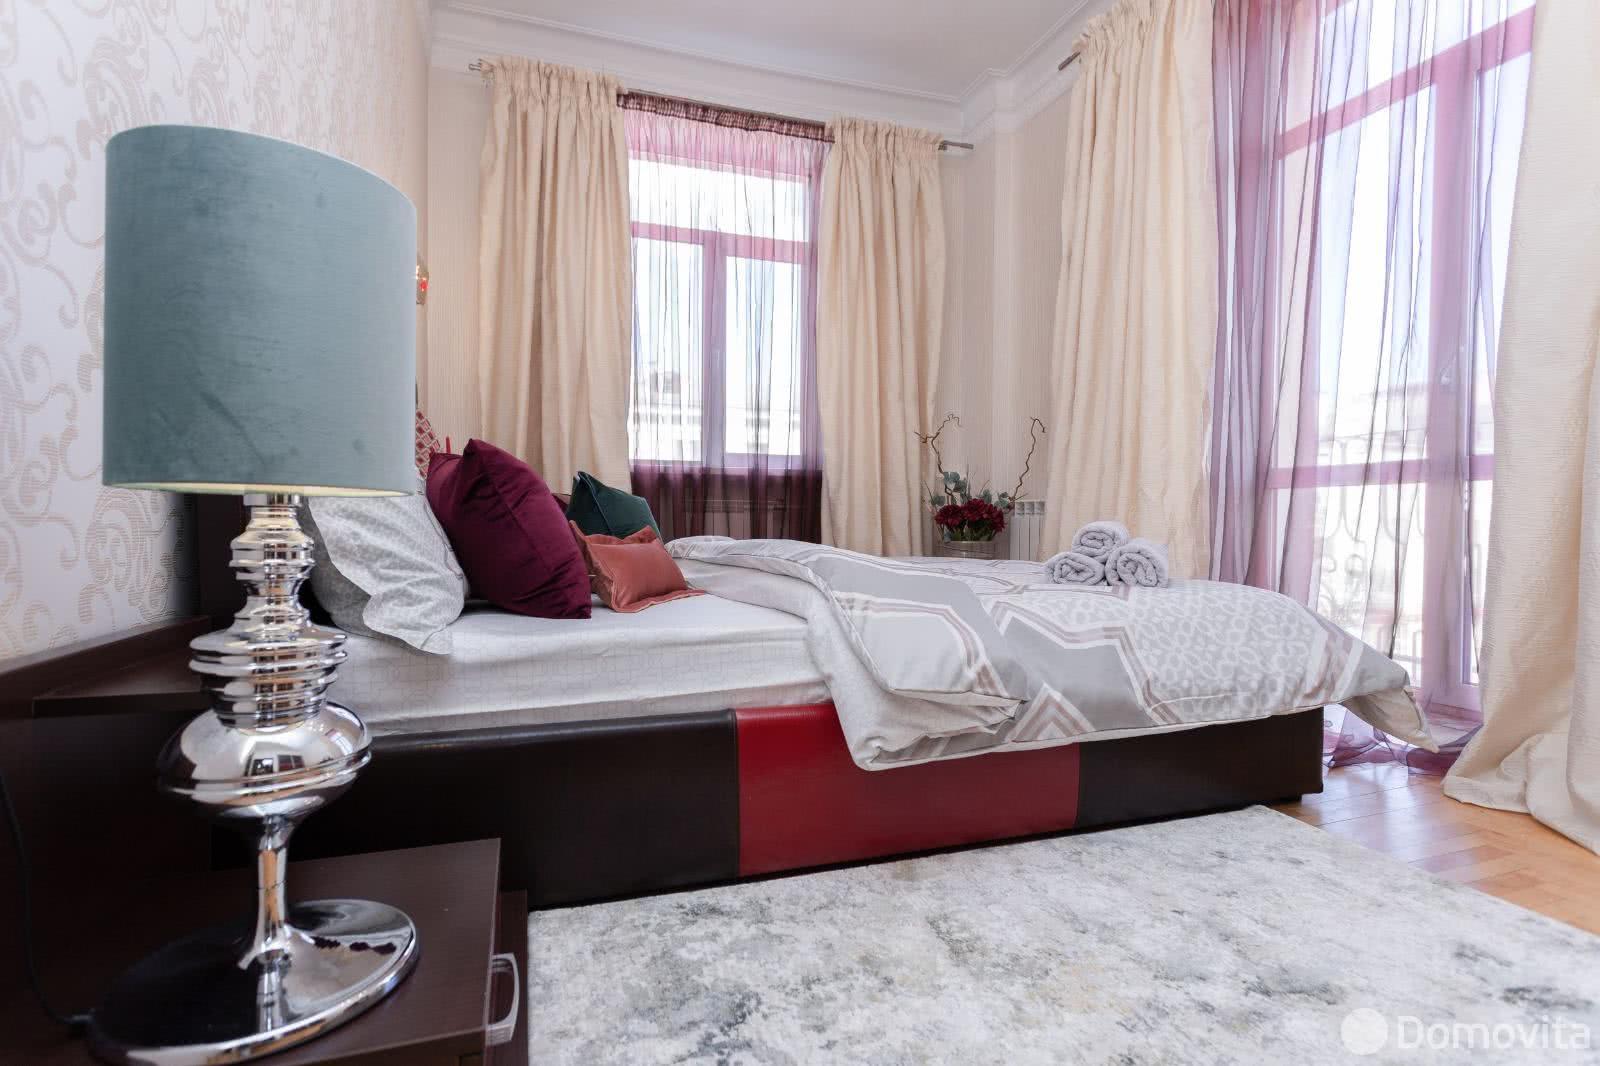 Аренда 2-комнатной квартиры на сутки в Минске ул. Красная, д. 18 - фото 6